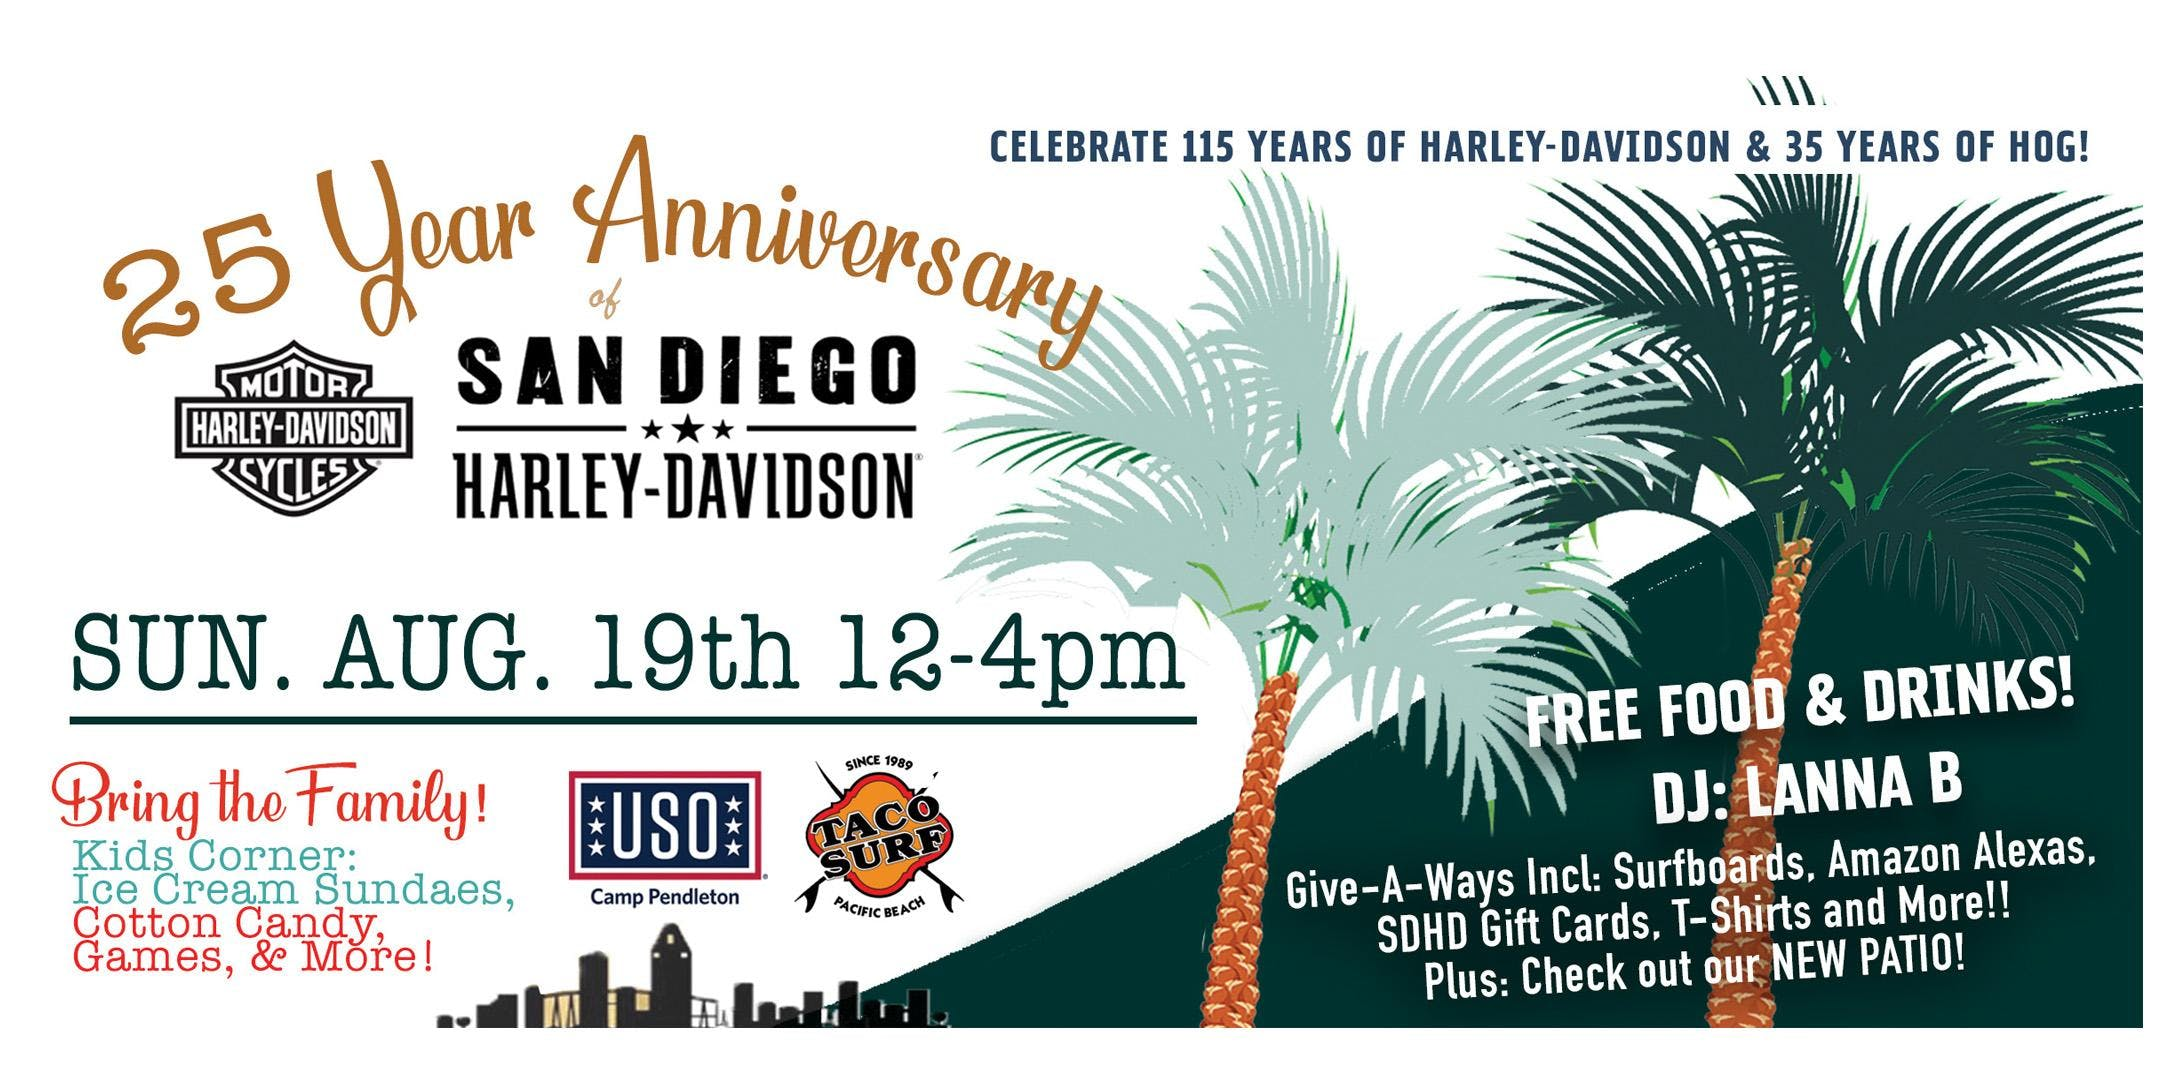 san diego harley davidson 25 year anniversary party